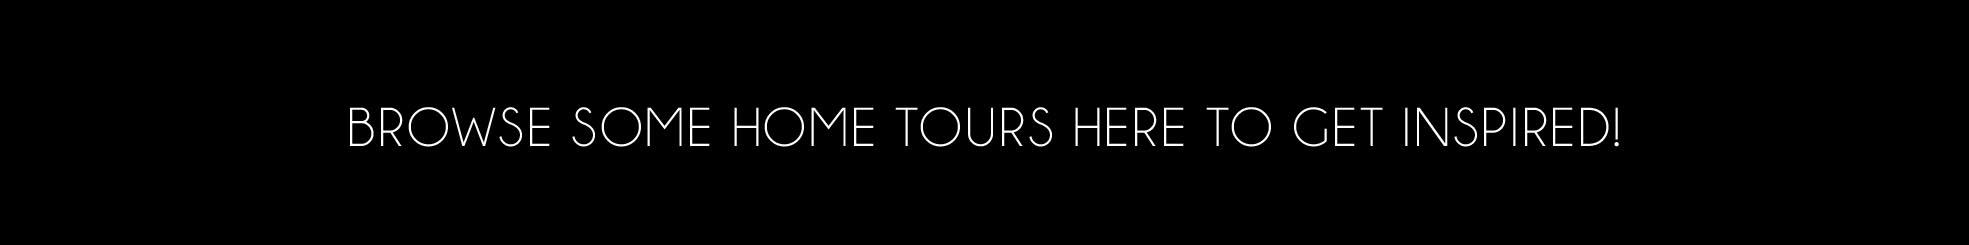 HOME TOURS BANNER.jpg